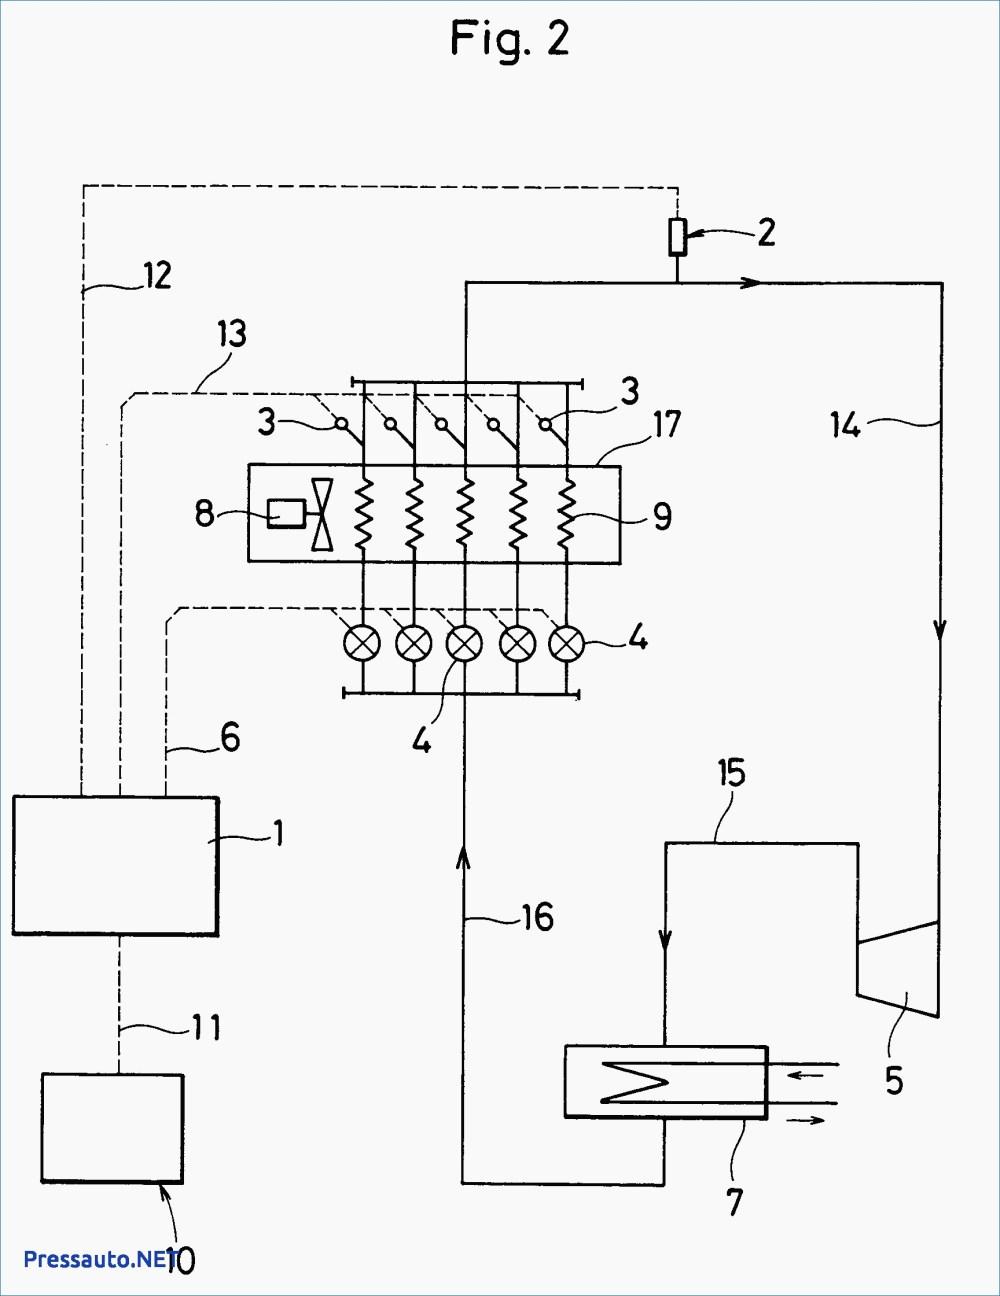 medium resolution of bohn walk in freezer wiring diagram wiring diagram amazing heatcraft refrigeration diagrams for freezer with